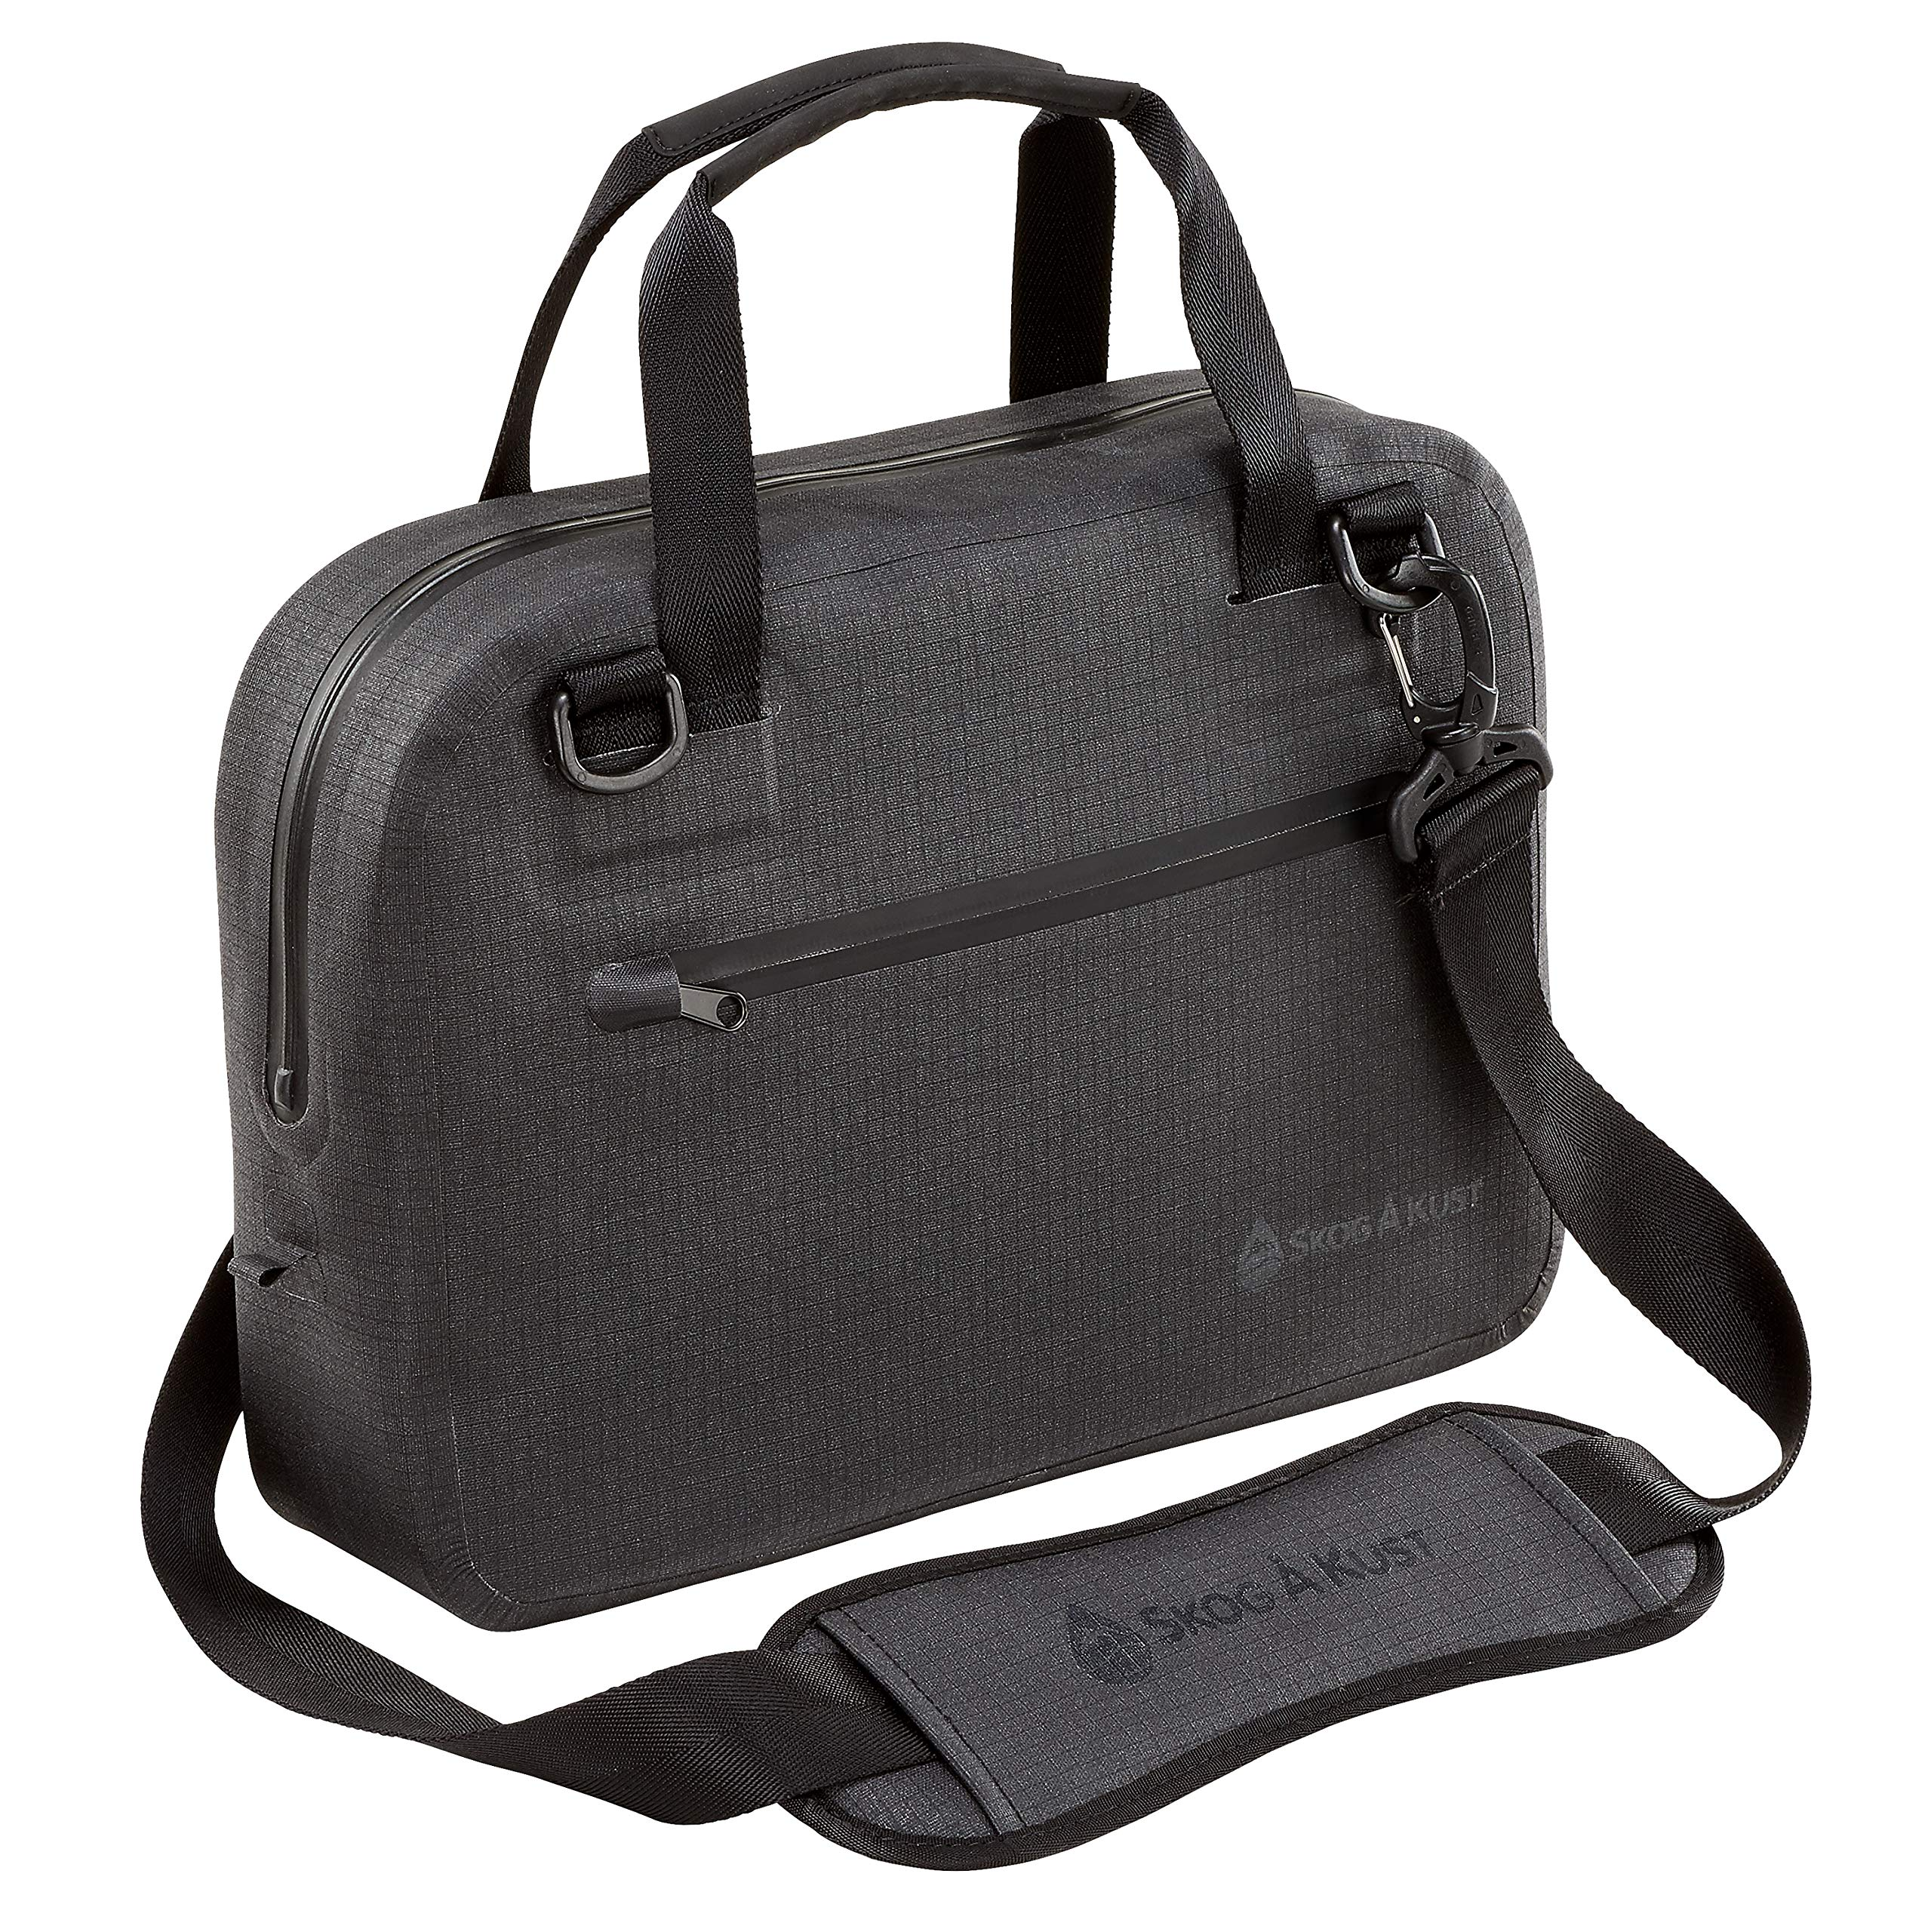 Såk Gear BriefSåk Pro 100% Waterproof & Airtight Messenger Bag   Black, 13''